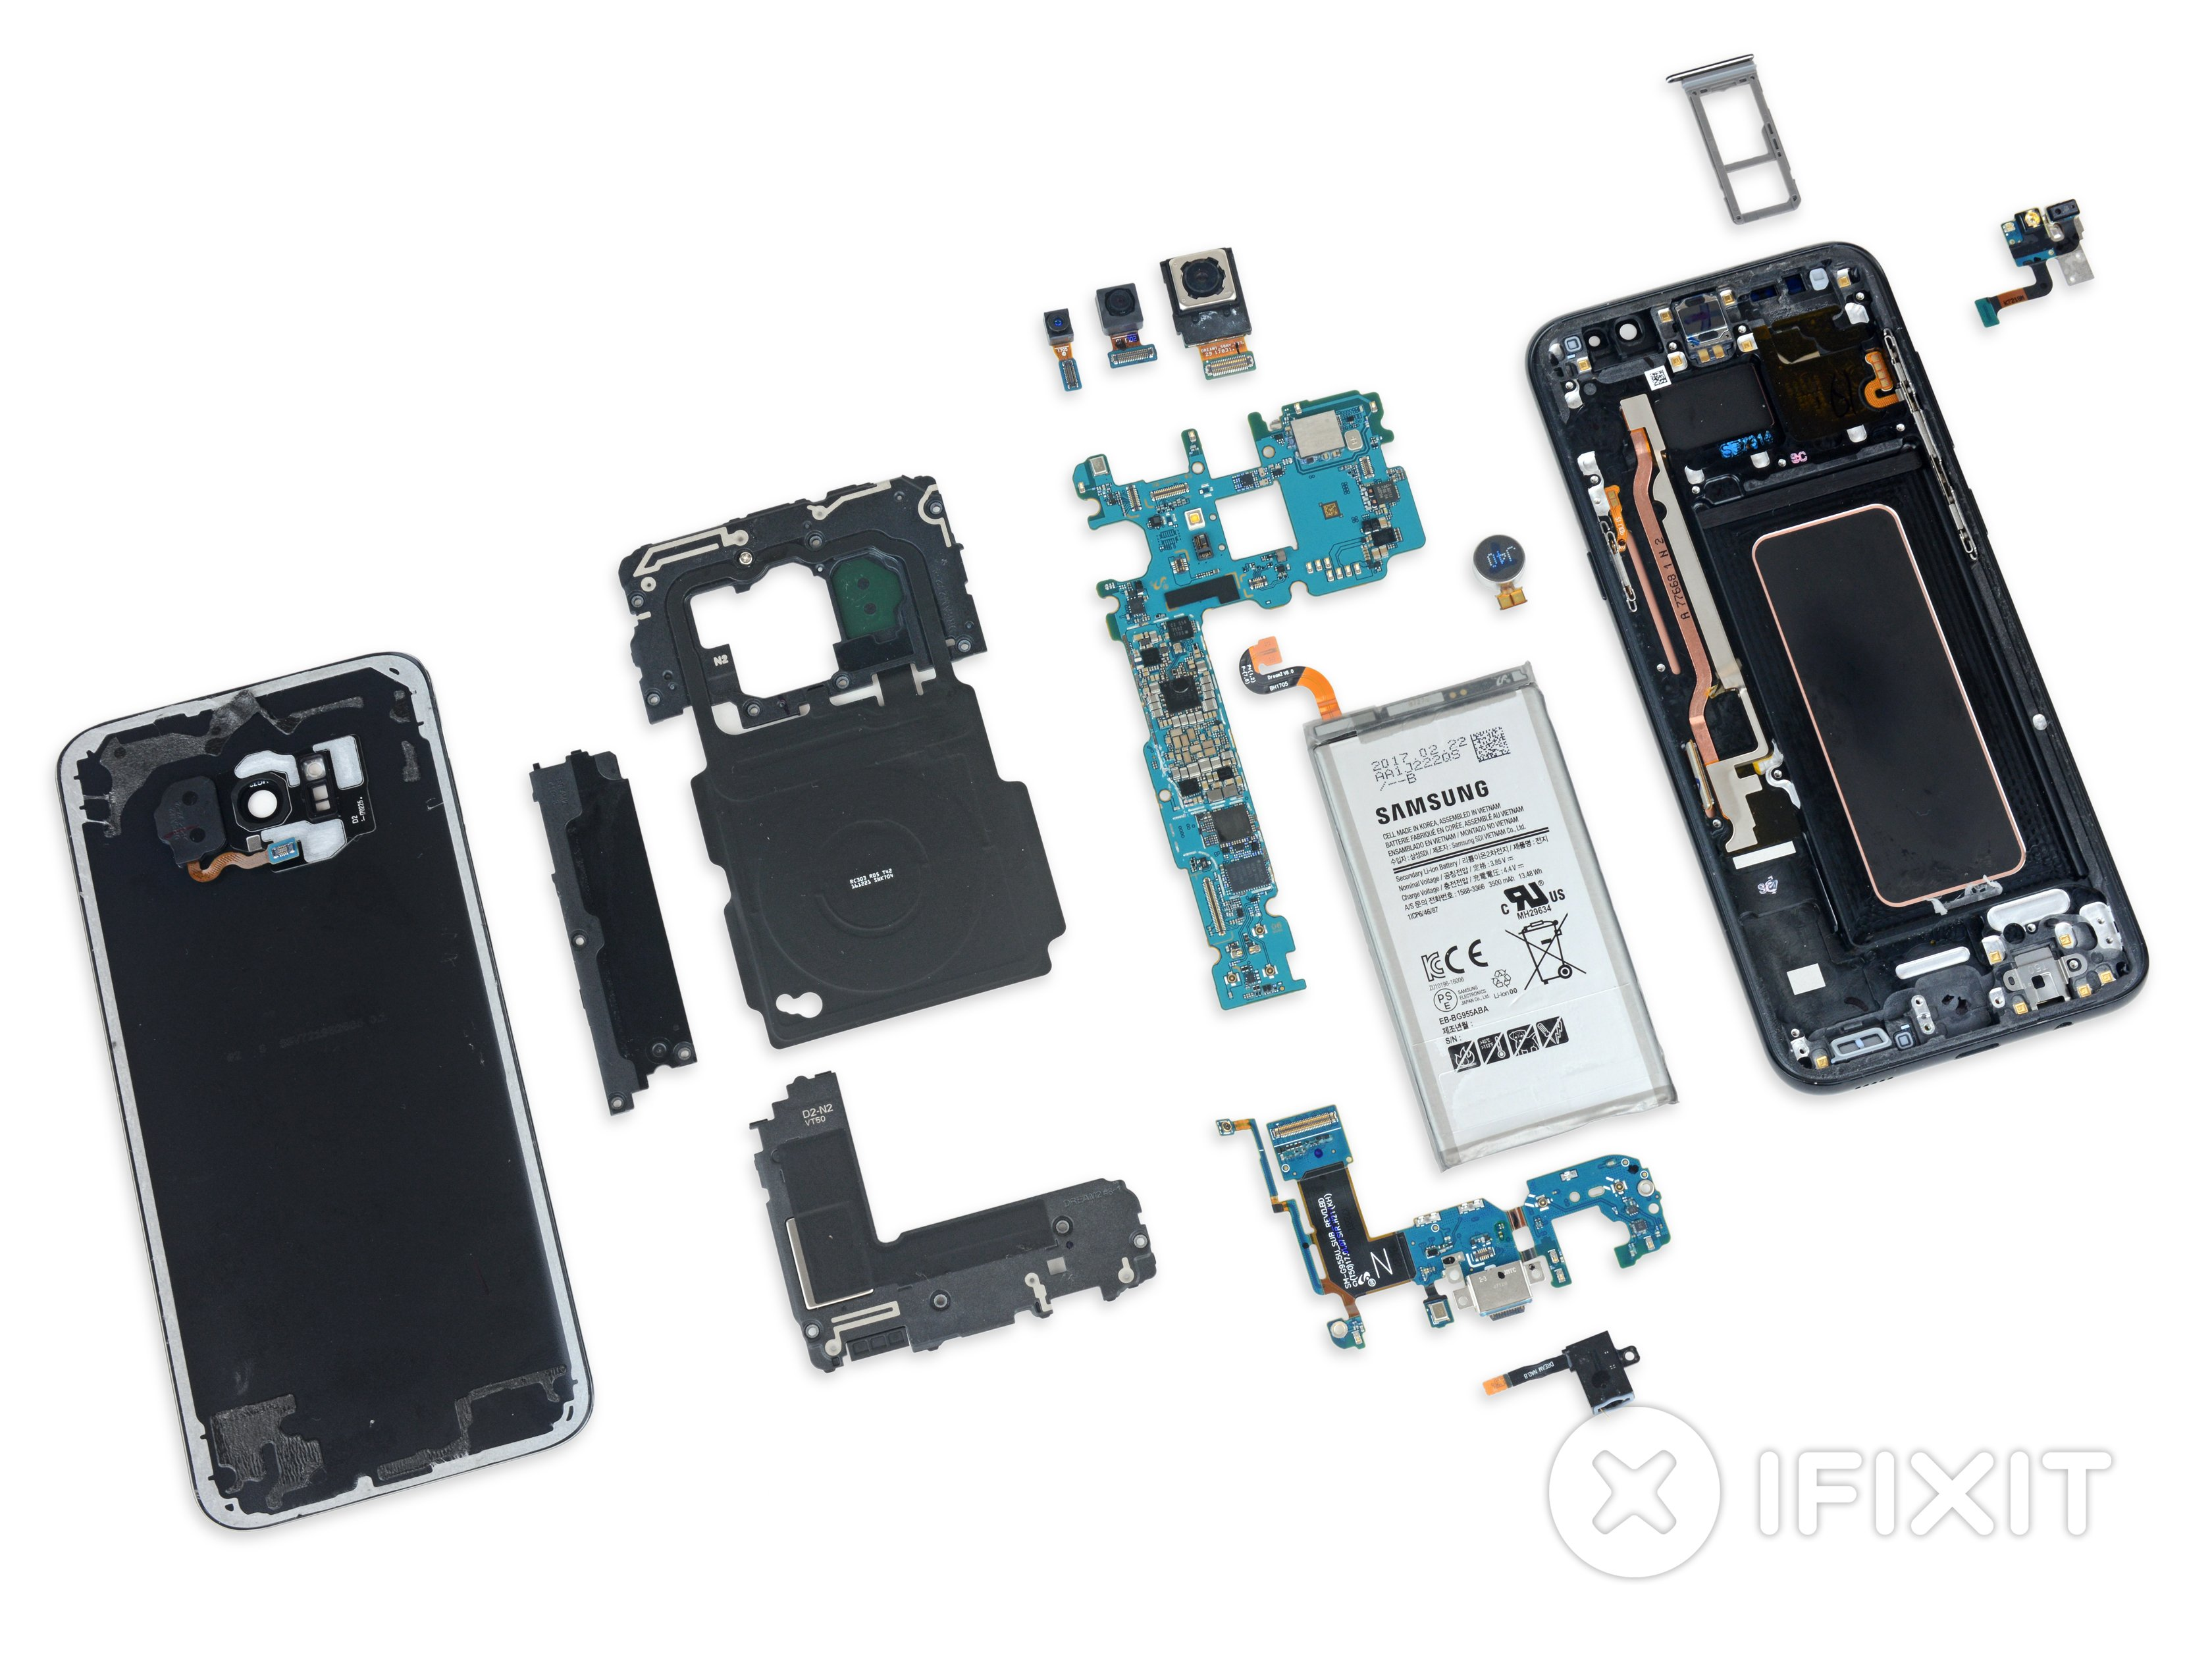 Blueprint Wallpaper Iphone 6 Samsung Galaxy S8 Teardown Ifixit